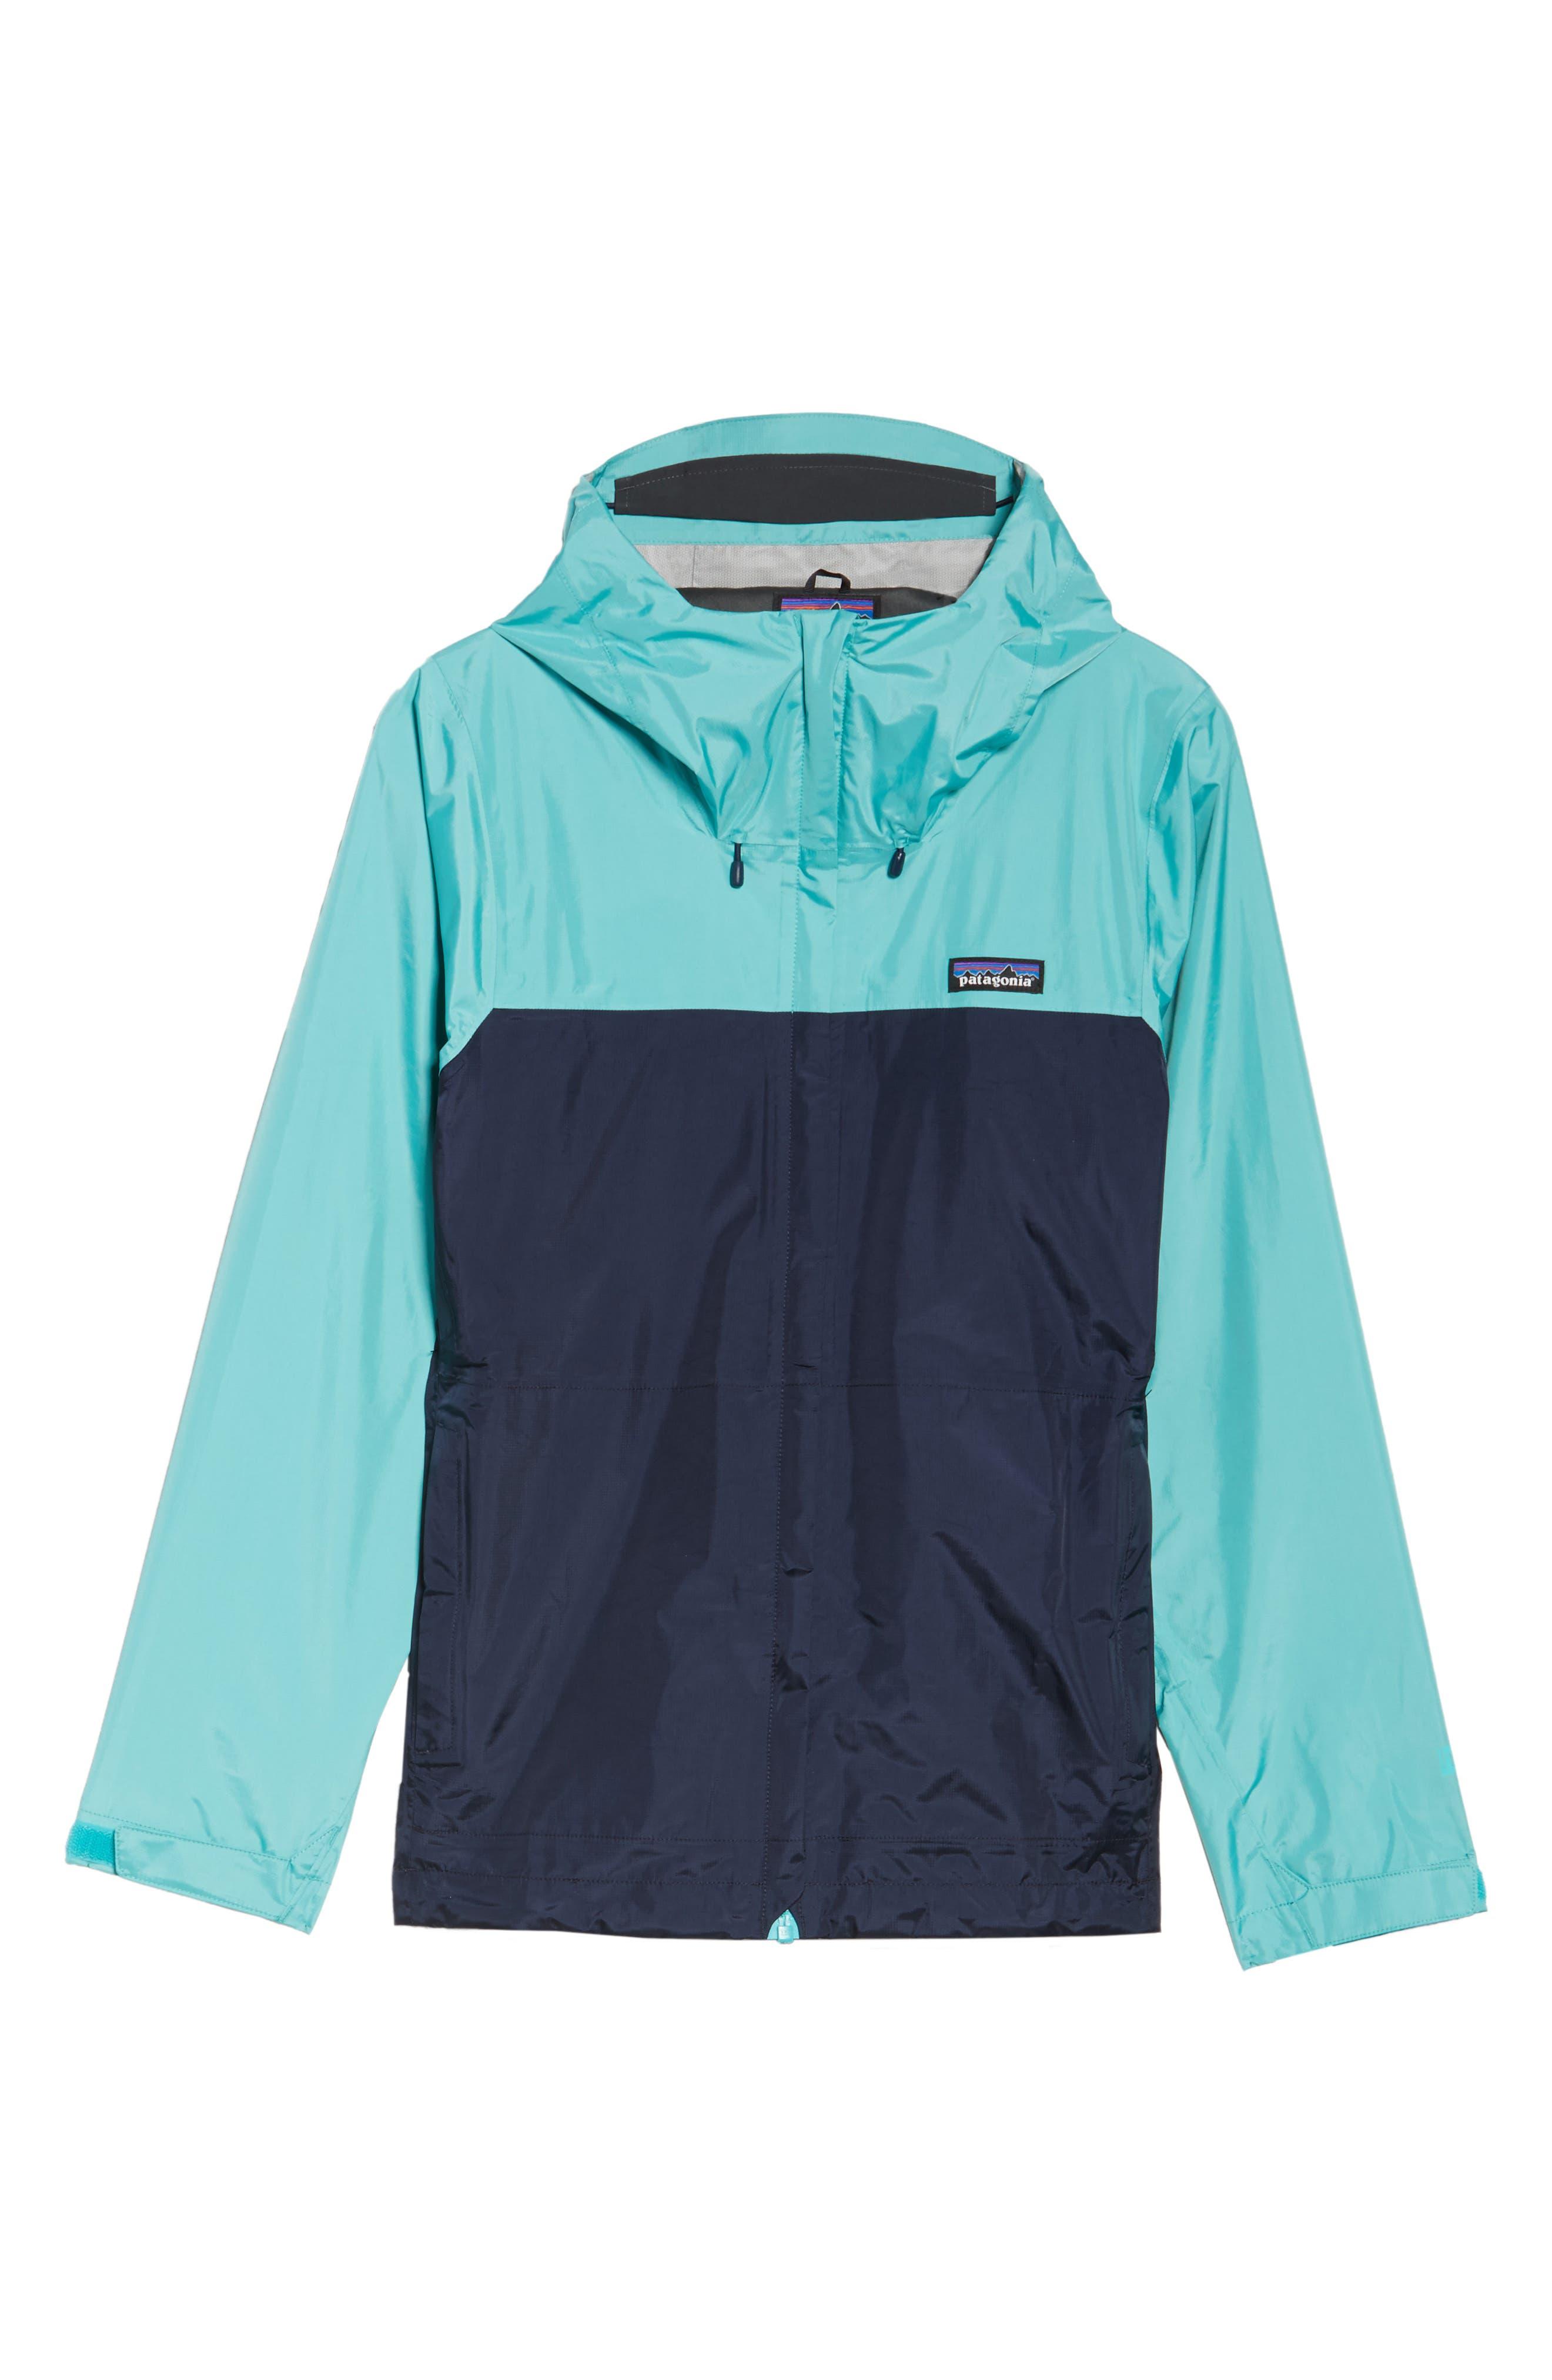 Torrentshell Jacket,                             Alternate thumbnail 7, color,                             Navy Blue/ Strait Blue